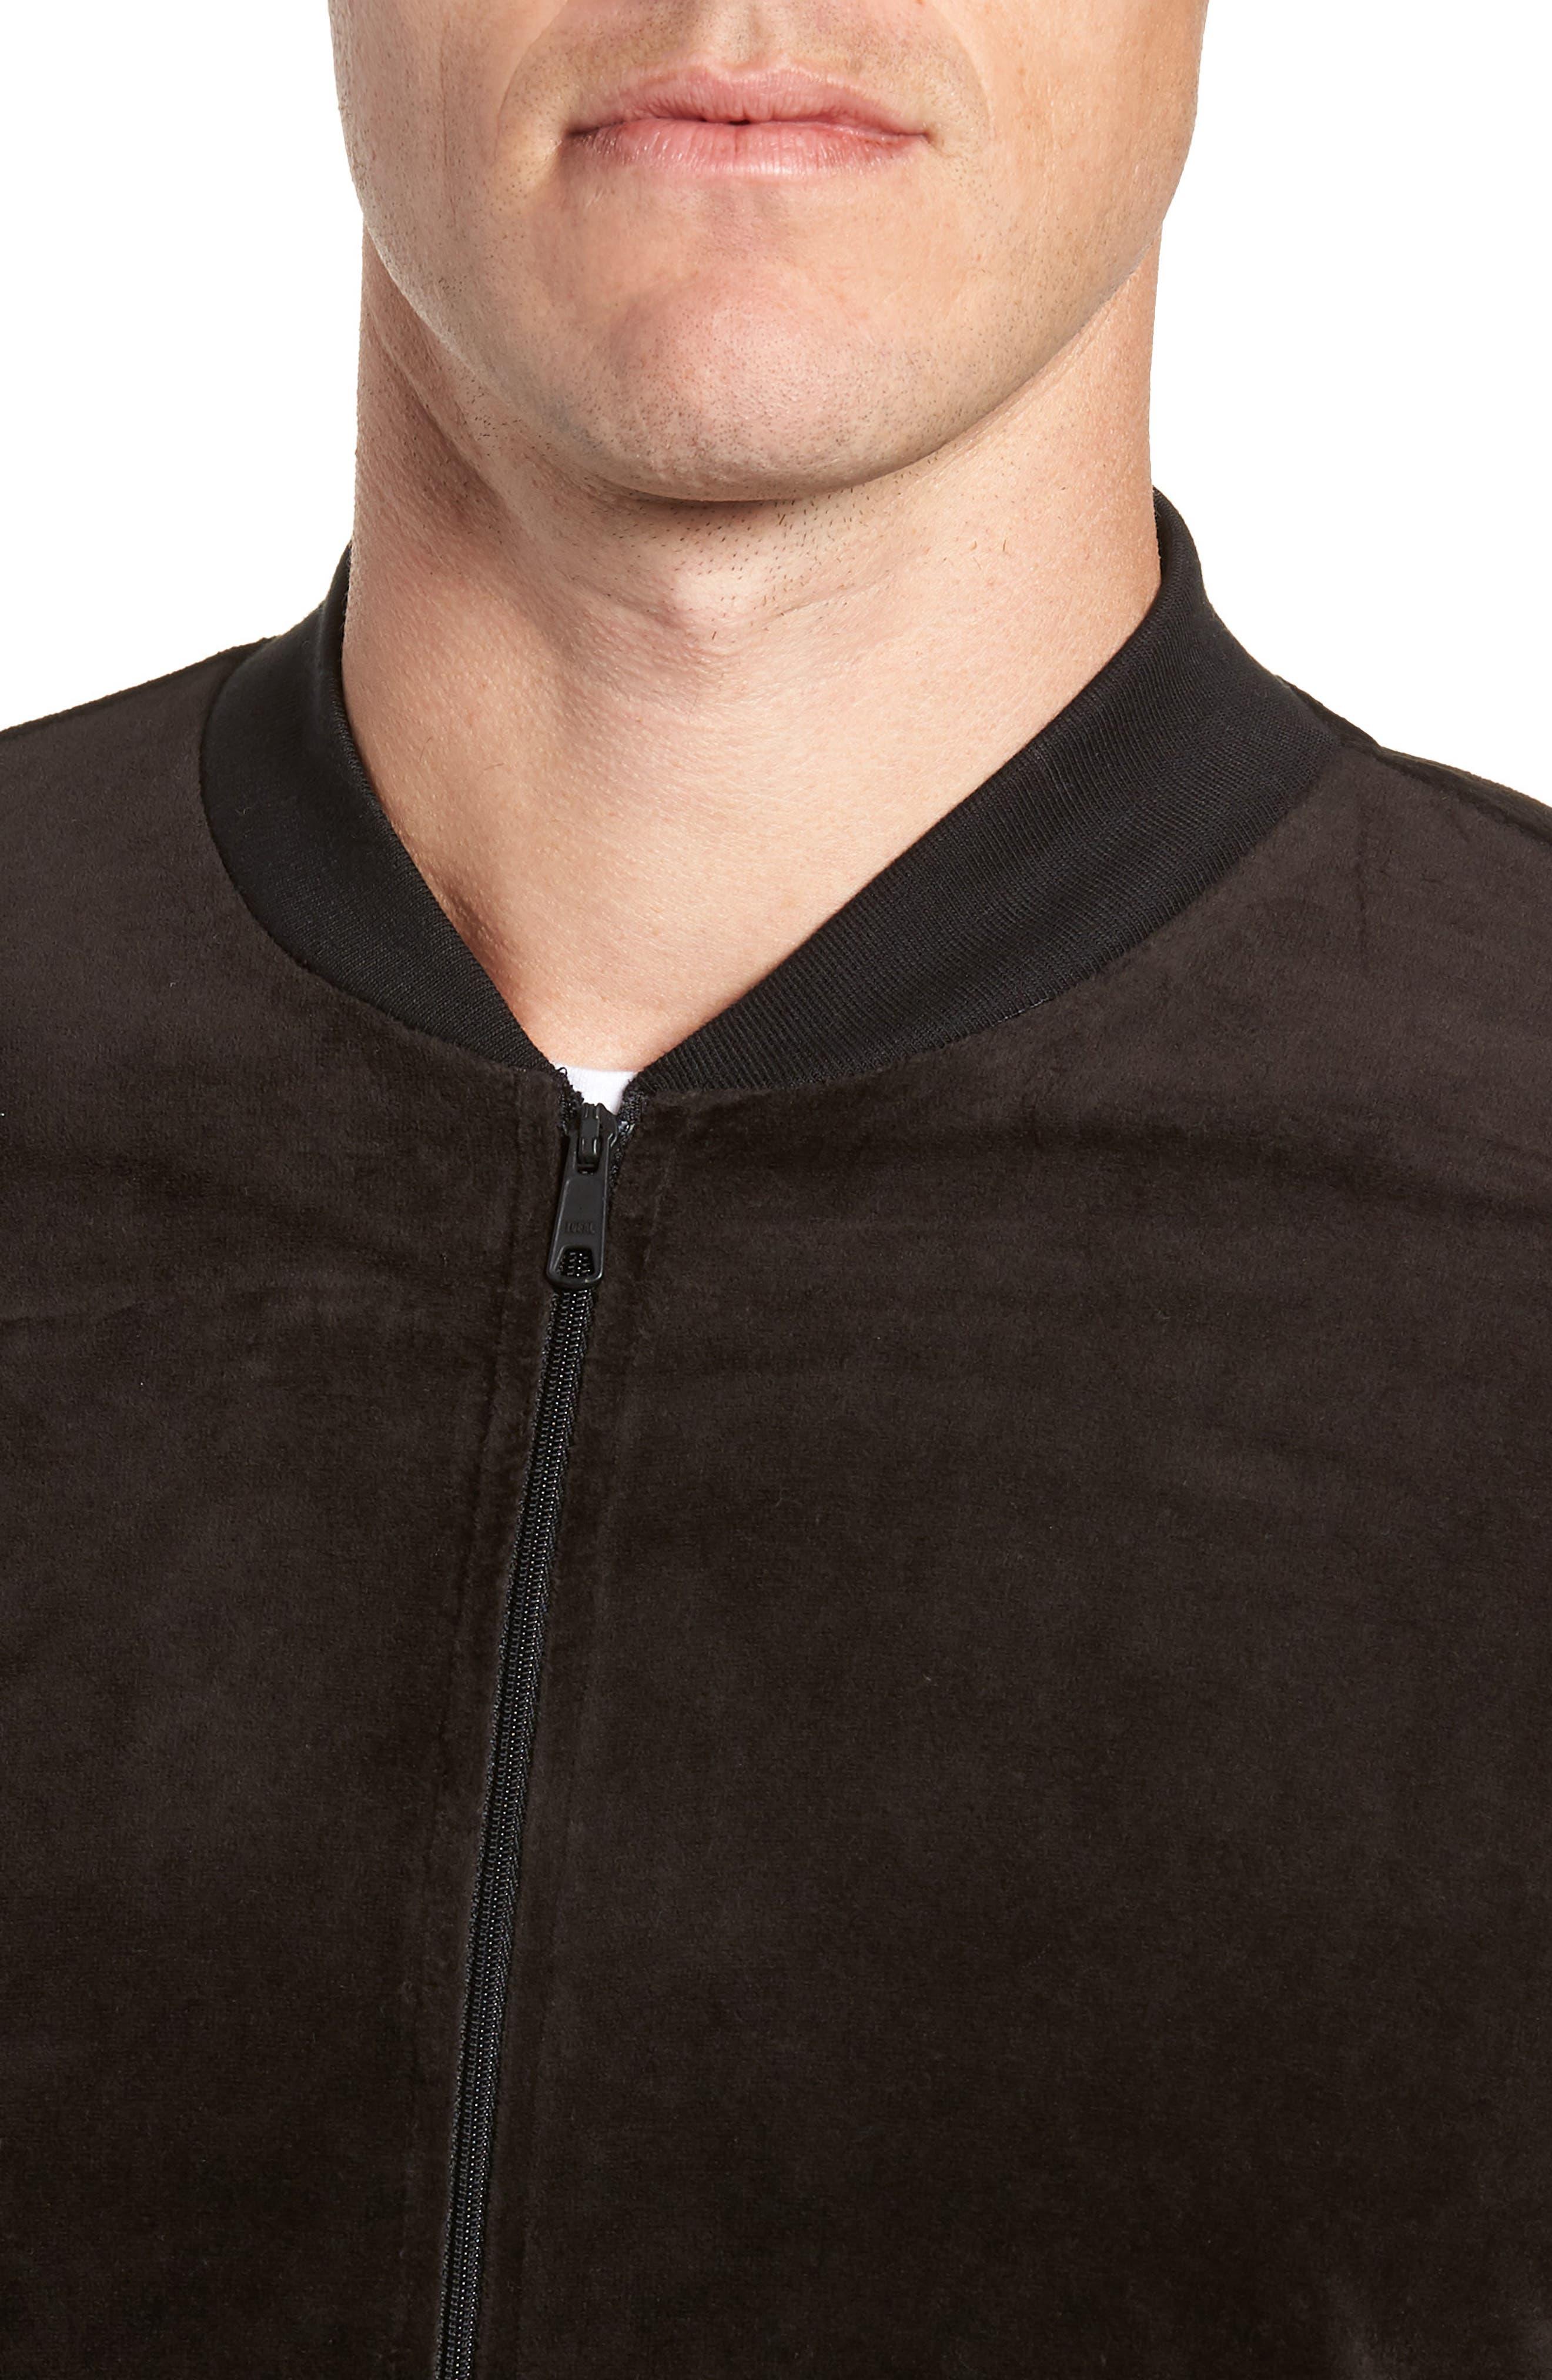 Velour Jacket,                             Alternate thumbnail 4, color,                             POLO BLACK